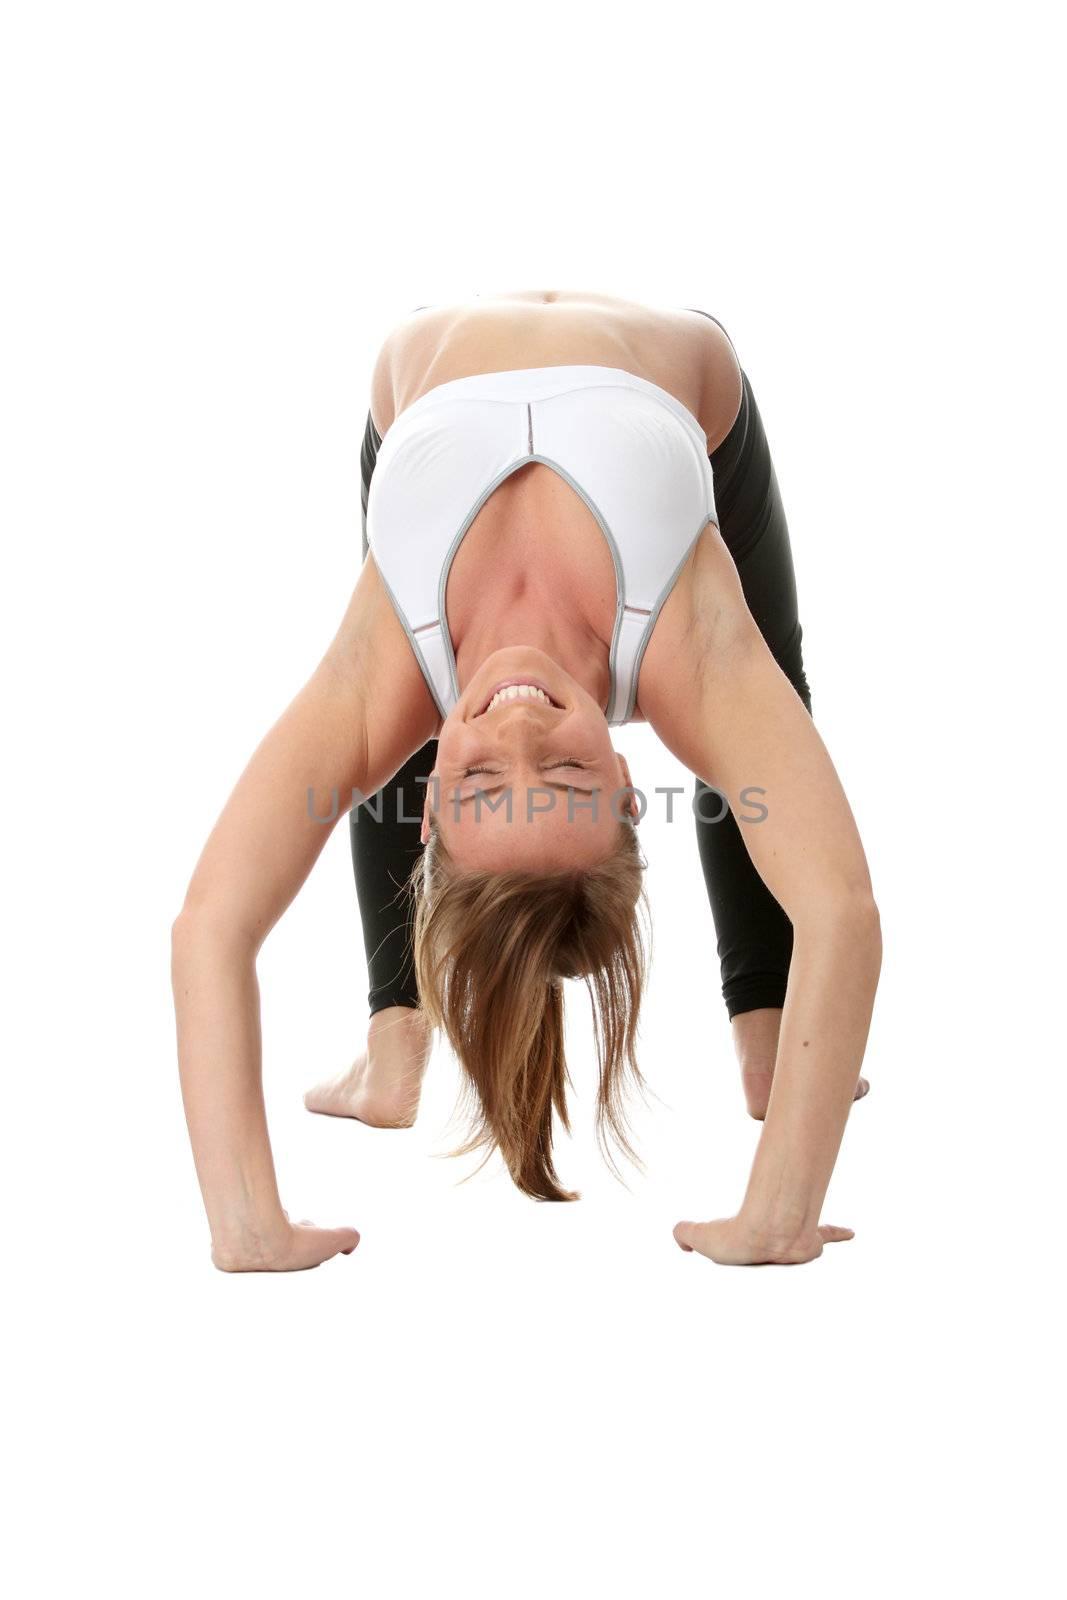 Young caucasian woman exercising yoga